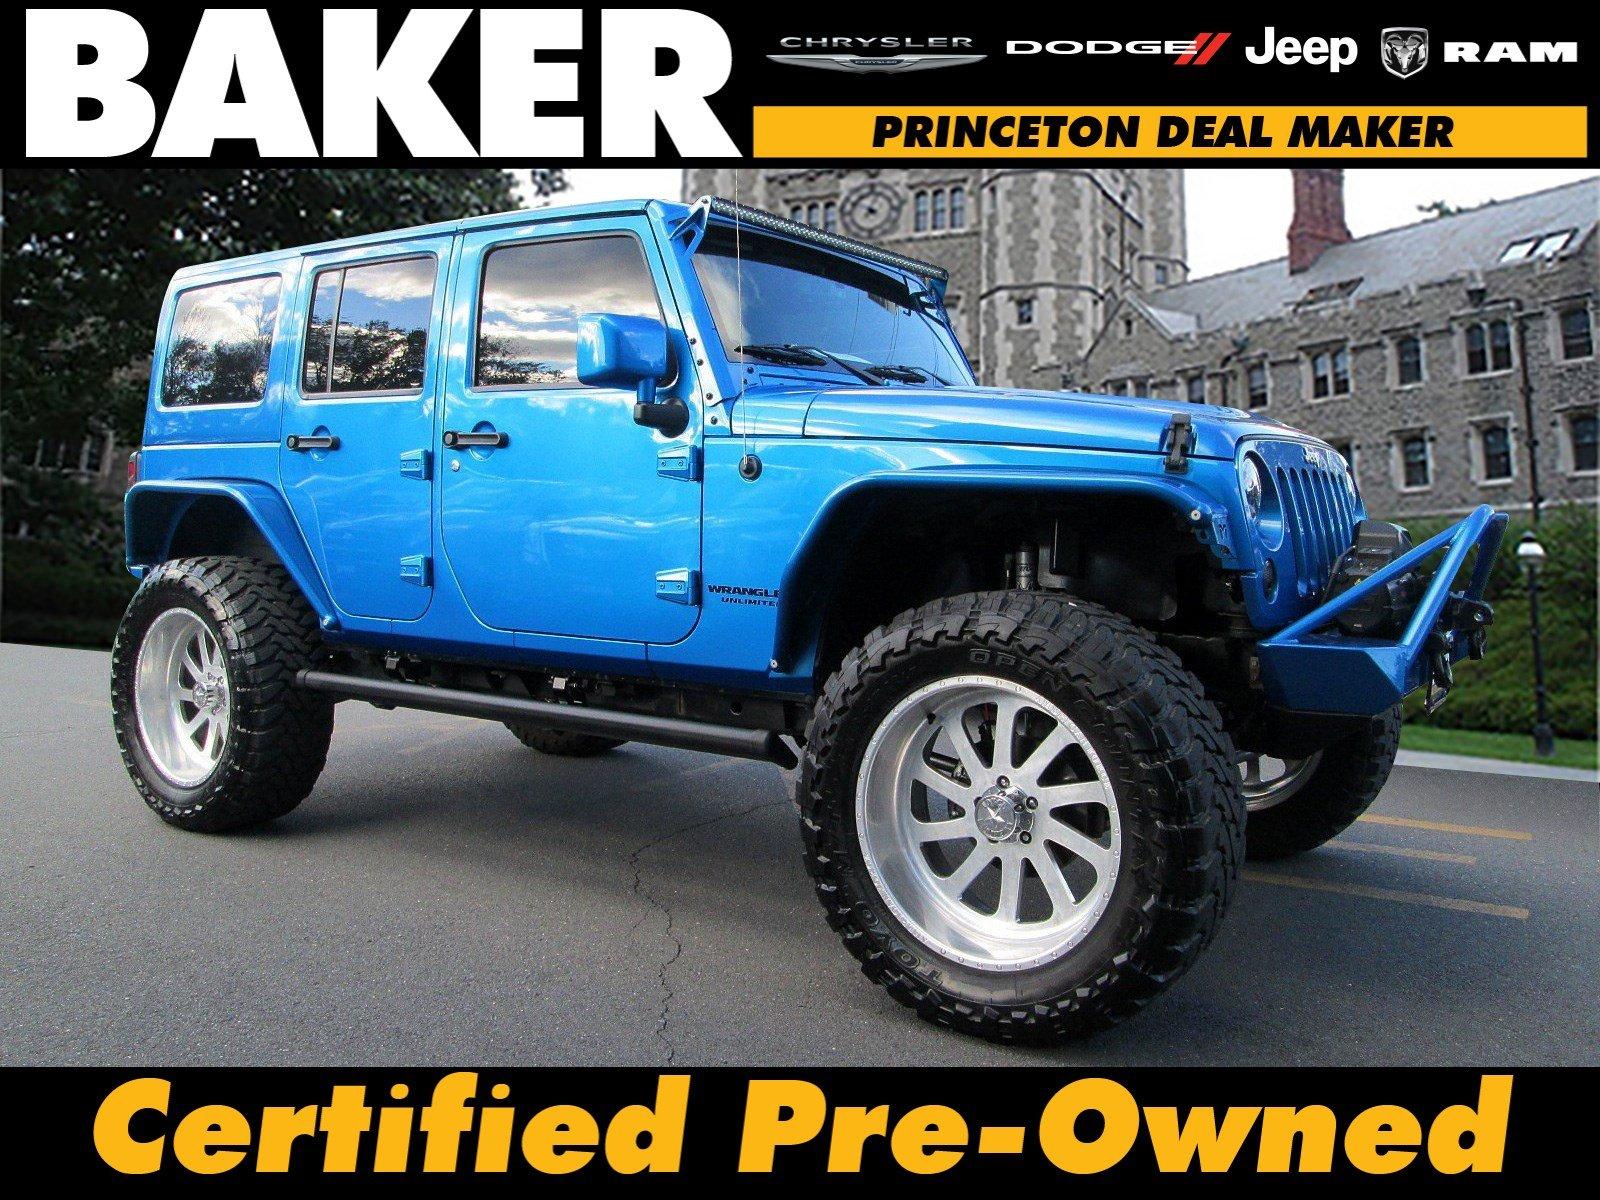 Used 2015 Jeep Wrangler Unlimited For Sale Somerset Nj Mopar Off Road Fog Driving Lights Wiring Kit Compass Patriot 1c4bjwdgxfl589159